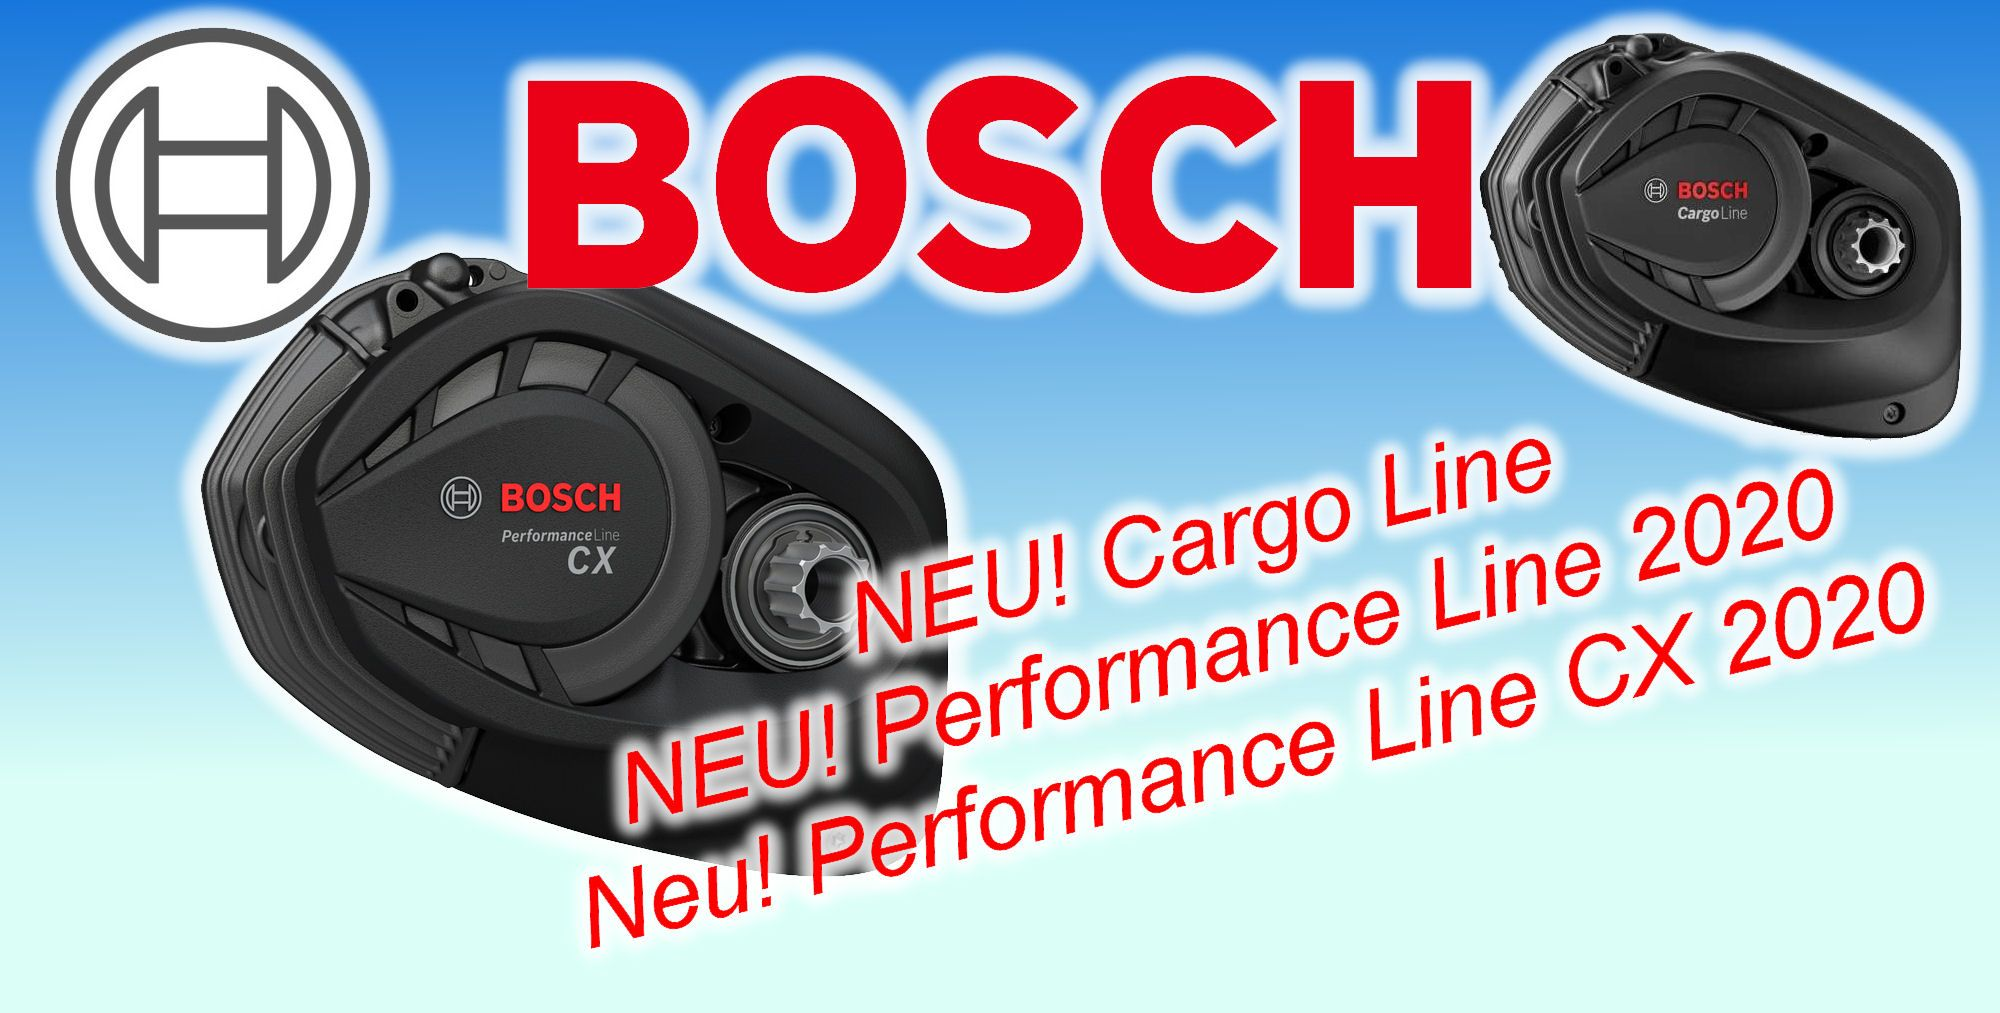 Bosch Cargo Line